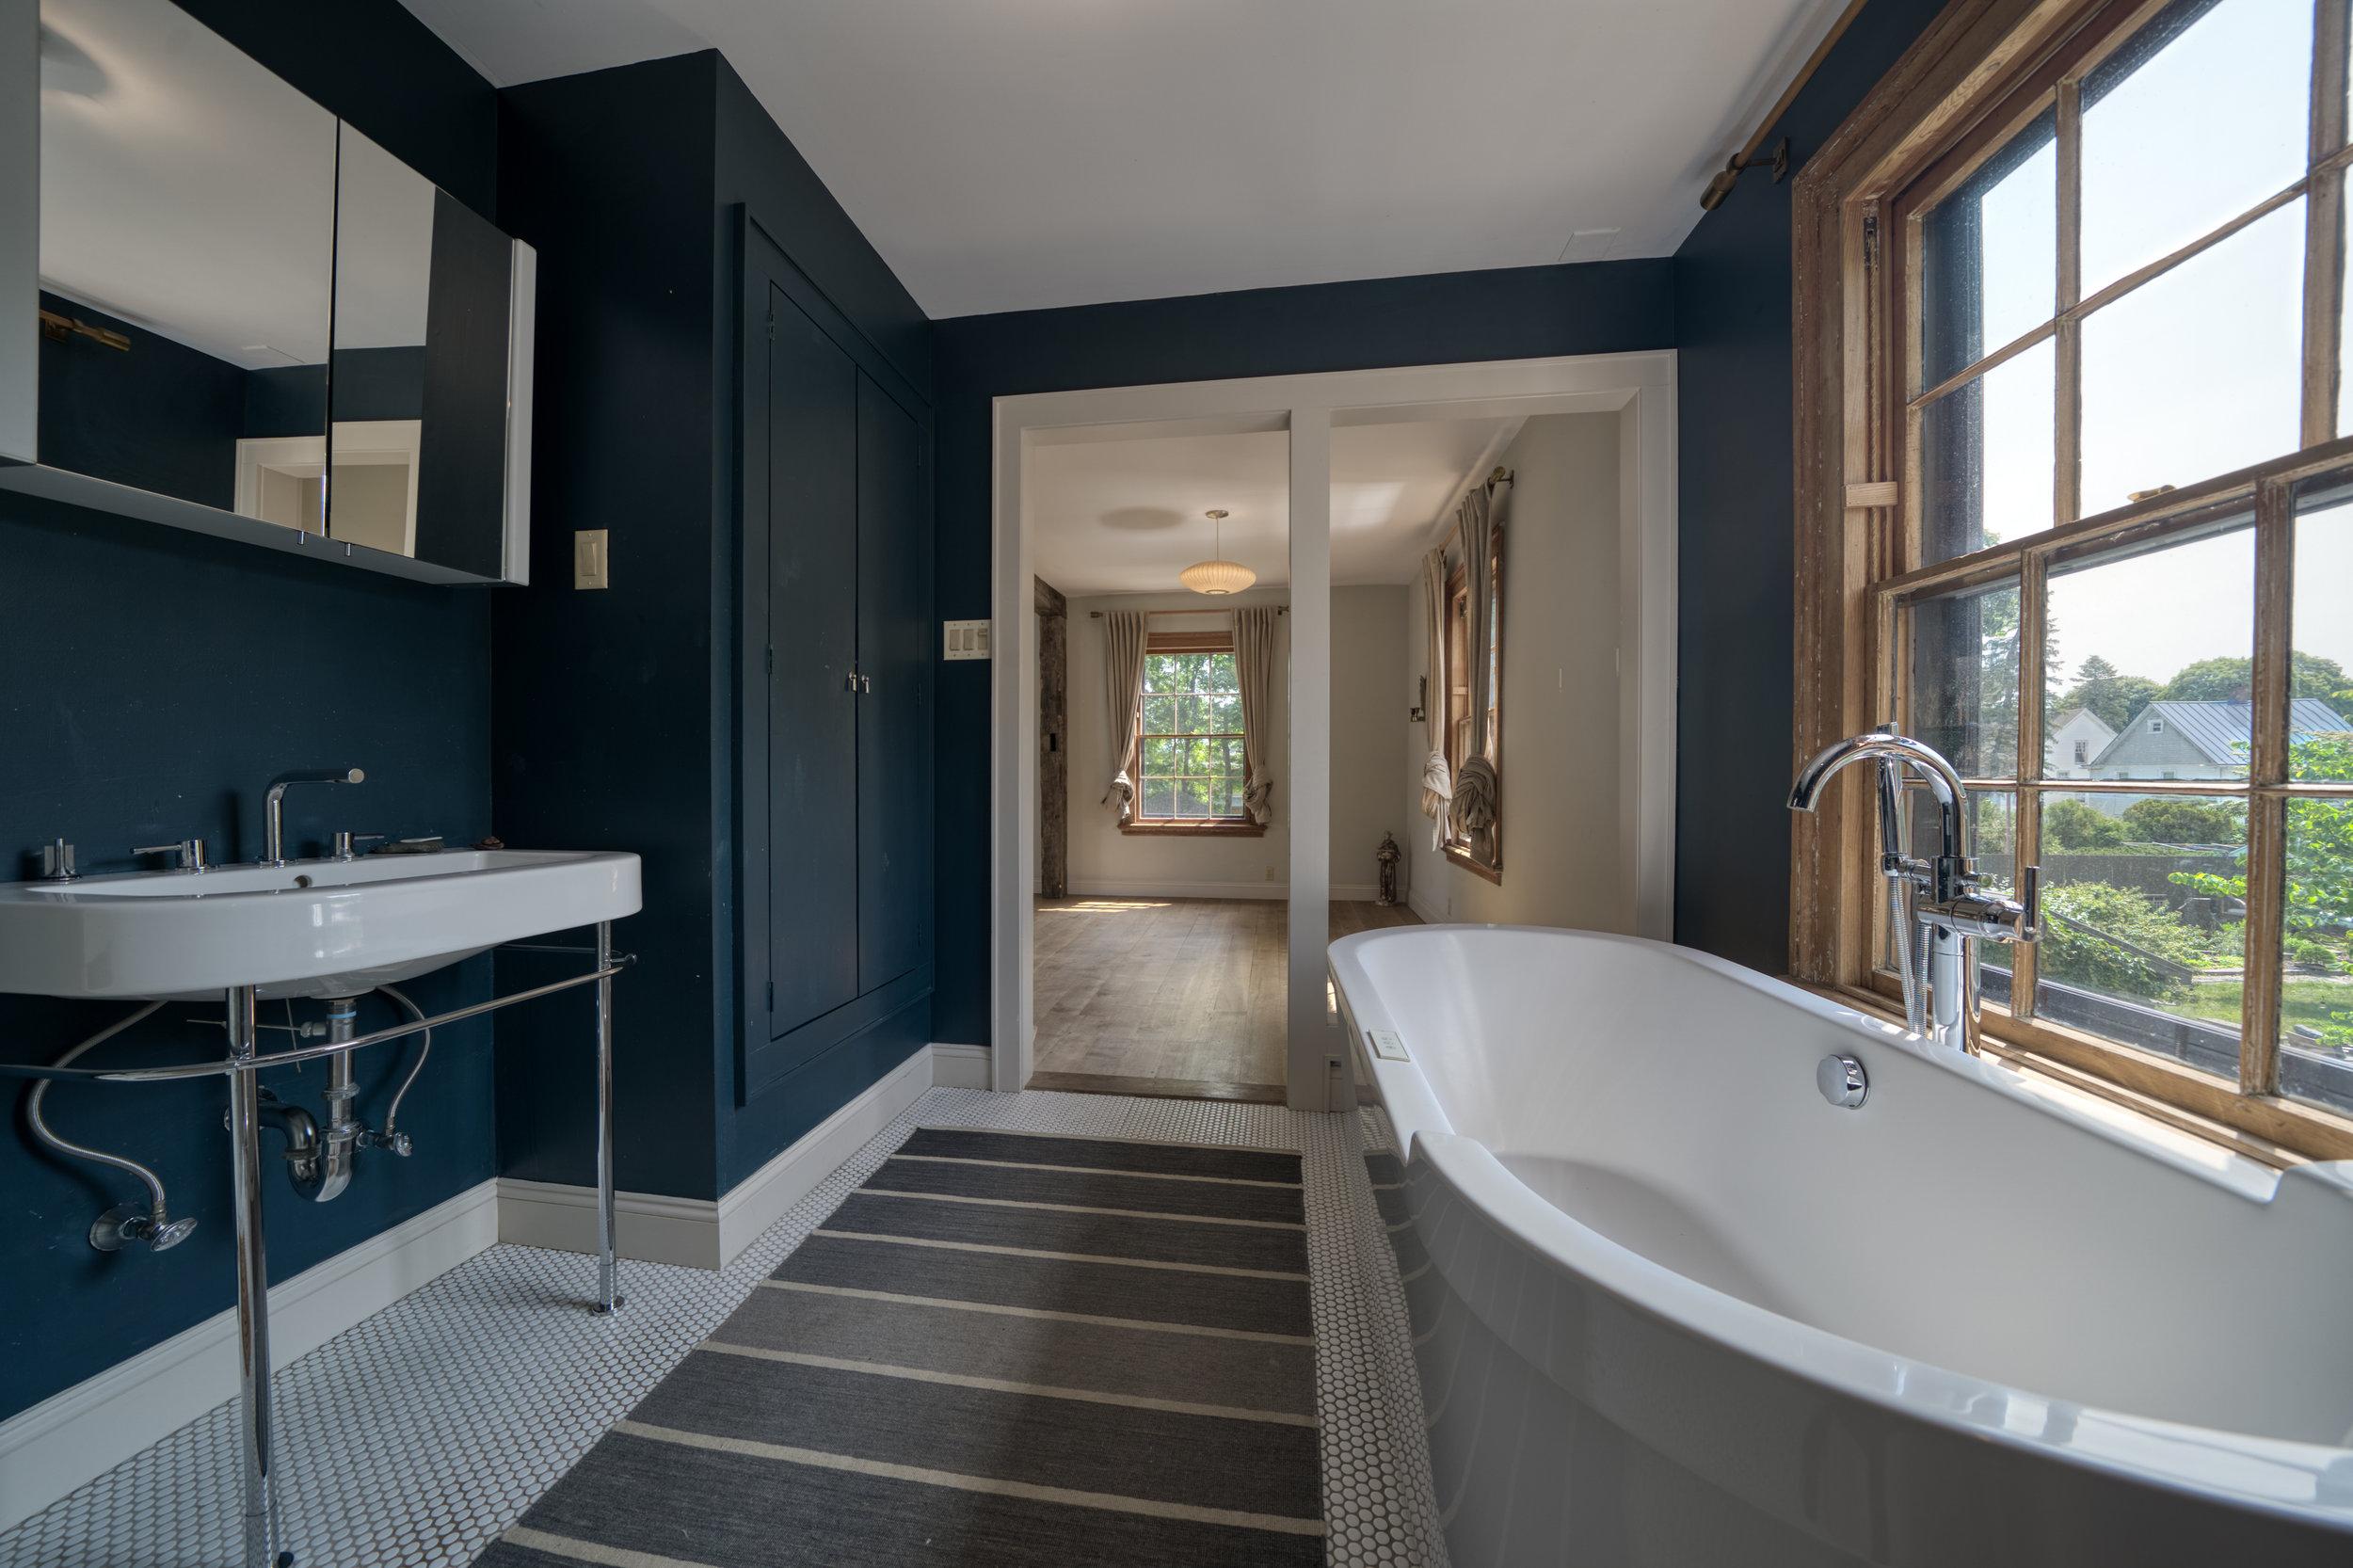 UptownKingston-Master-Bathroom-2.jpg